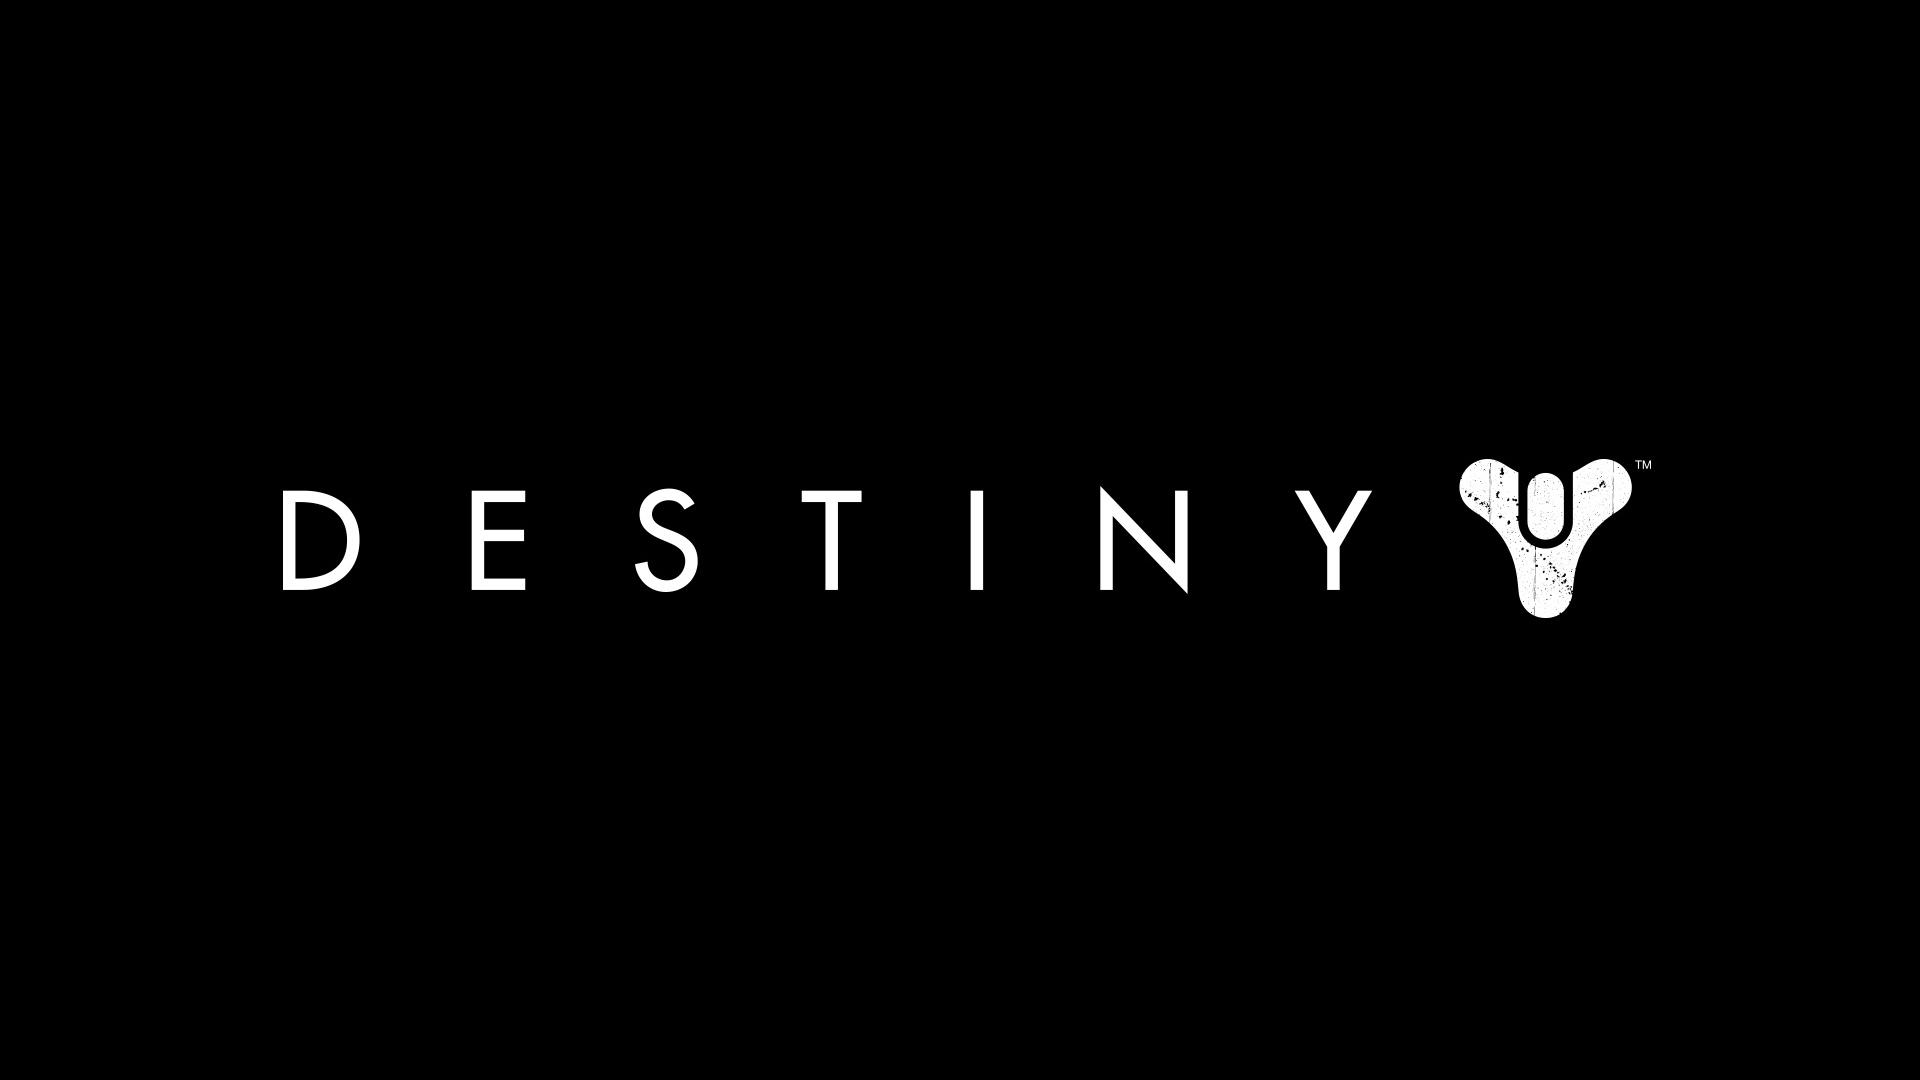 Destiny logo clipart vector freeuse stock Destiny Logo #6786576 vector freeuse stock